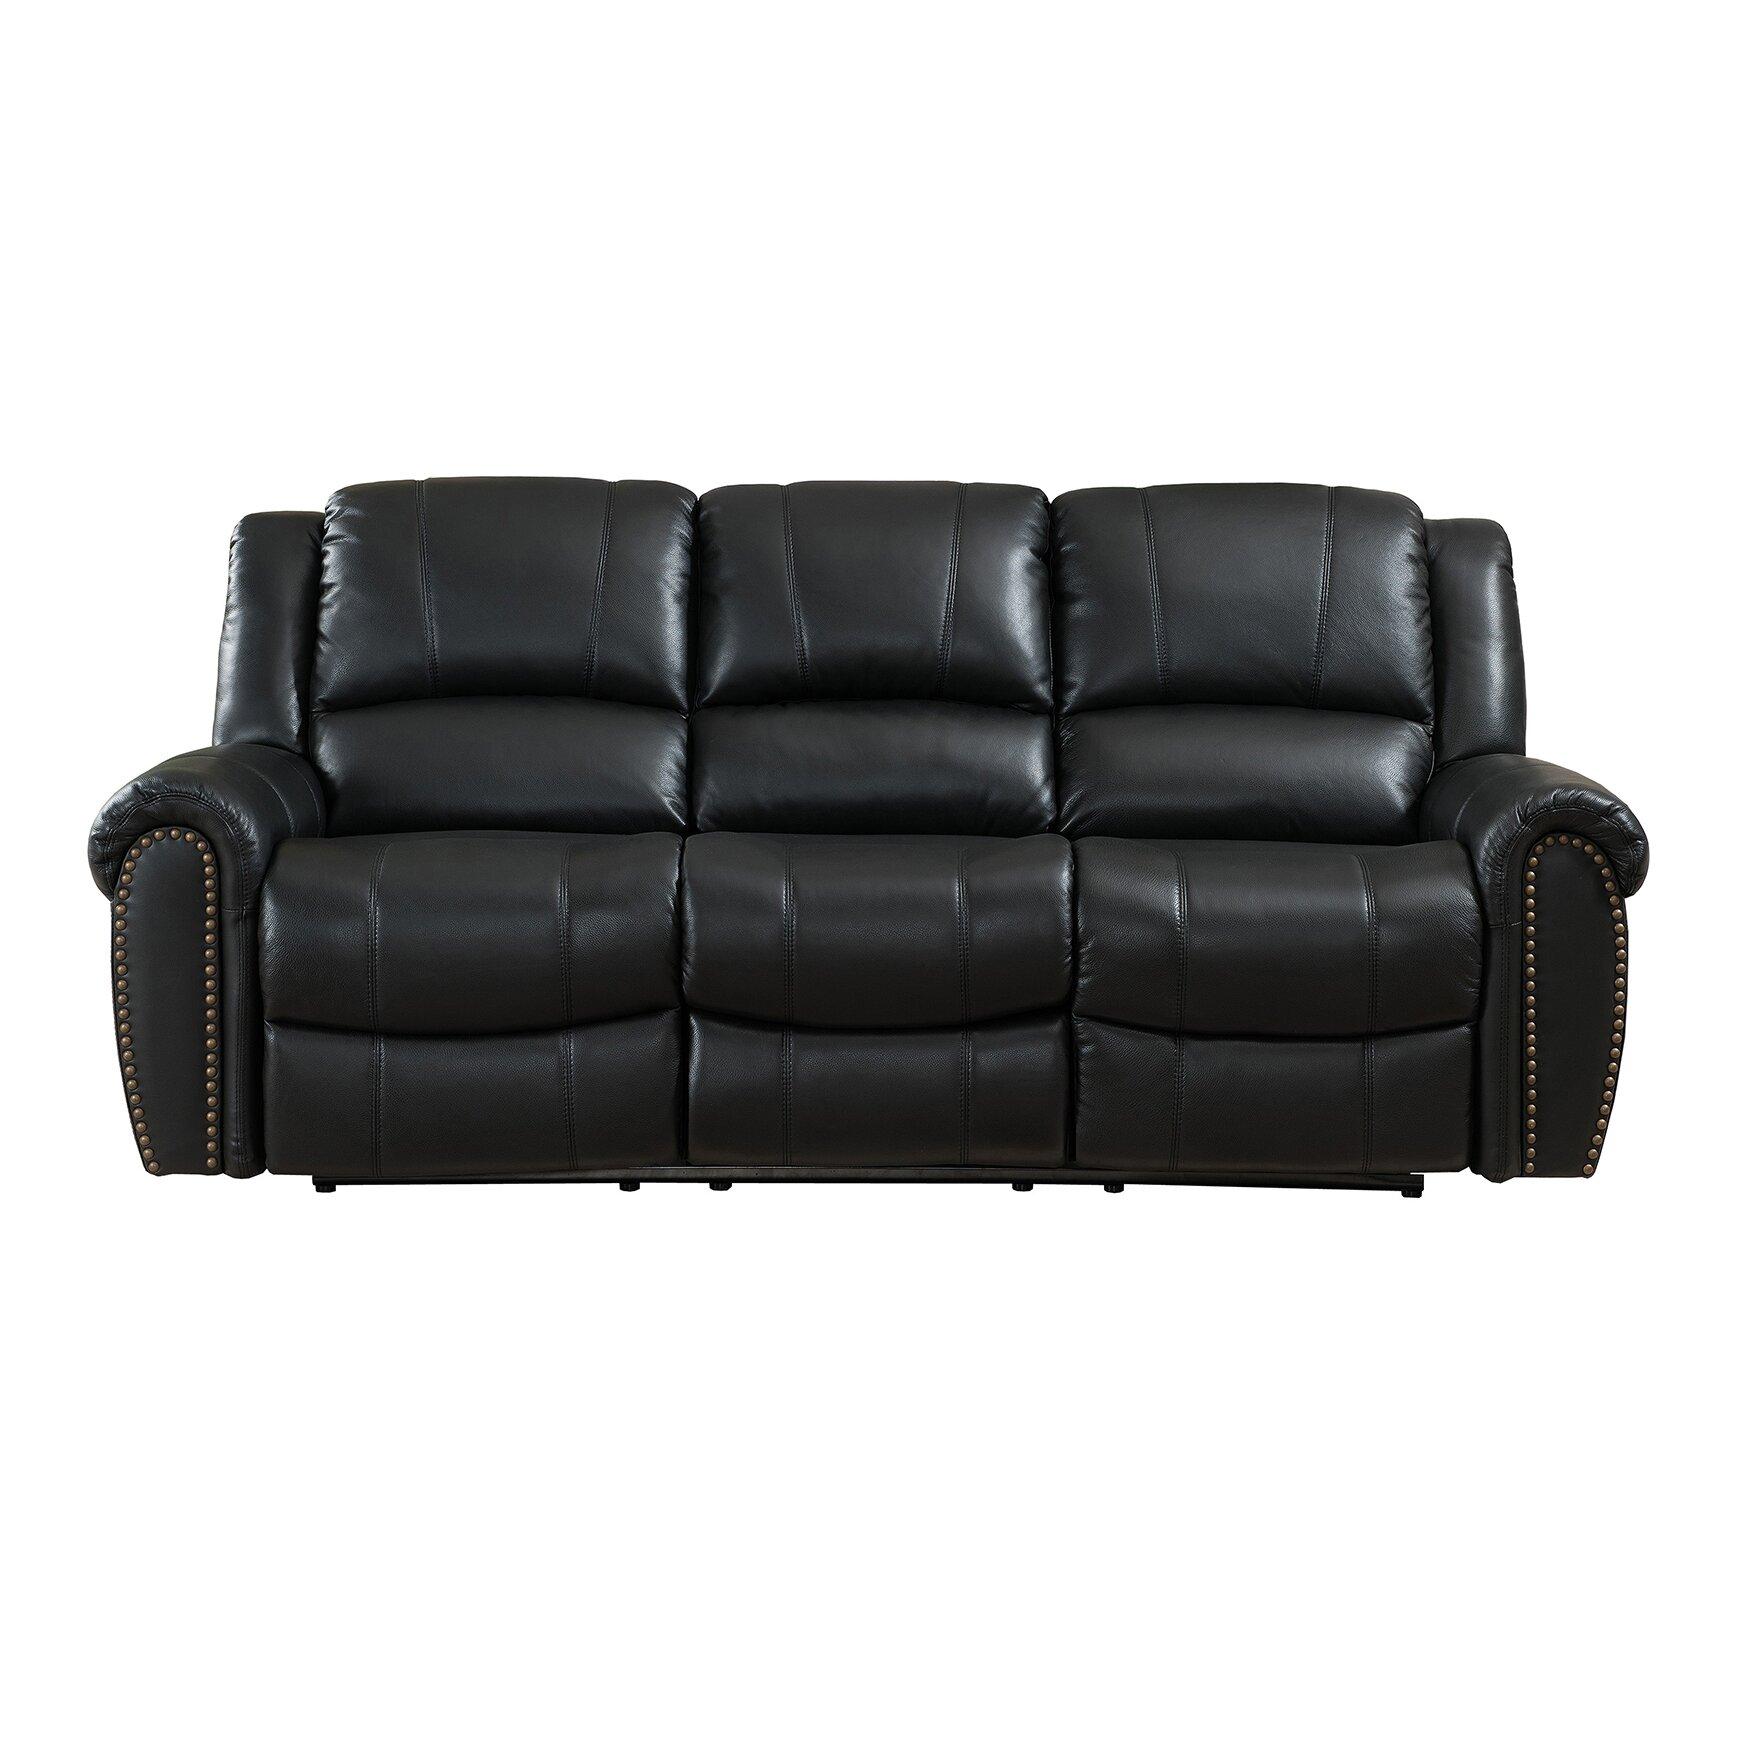 amax houston leather reclining sofa reviews wayfair